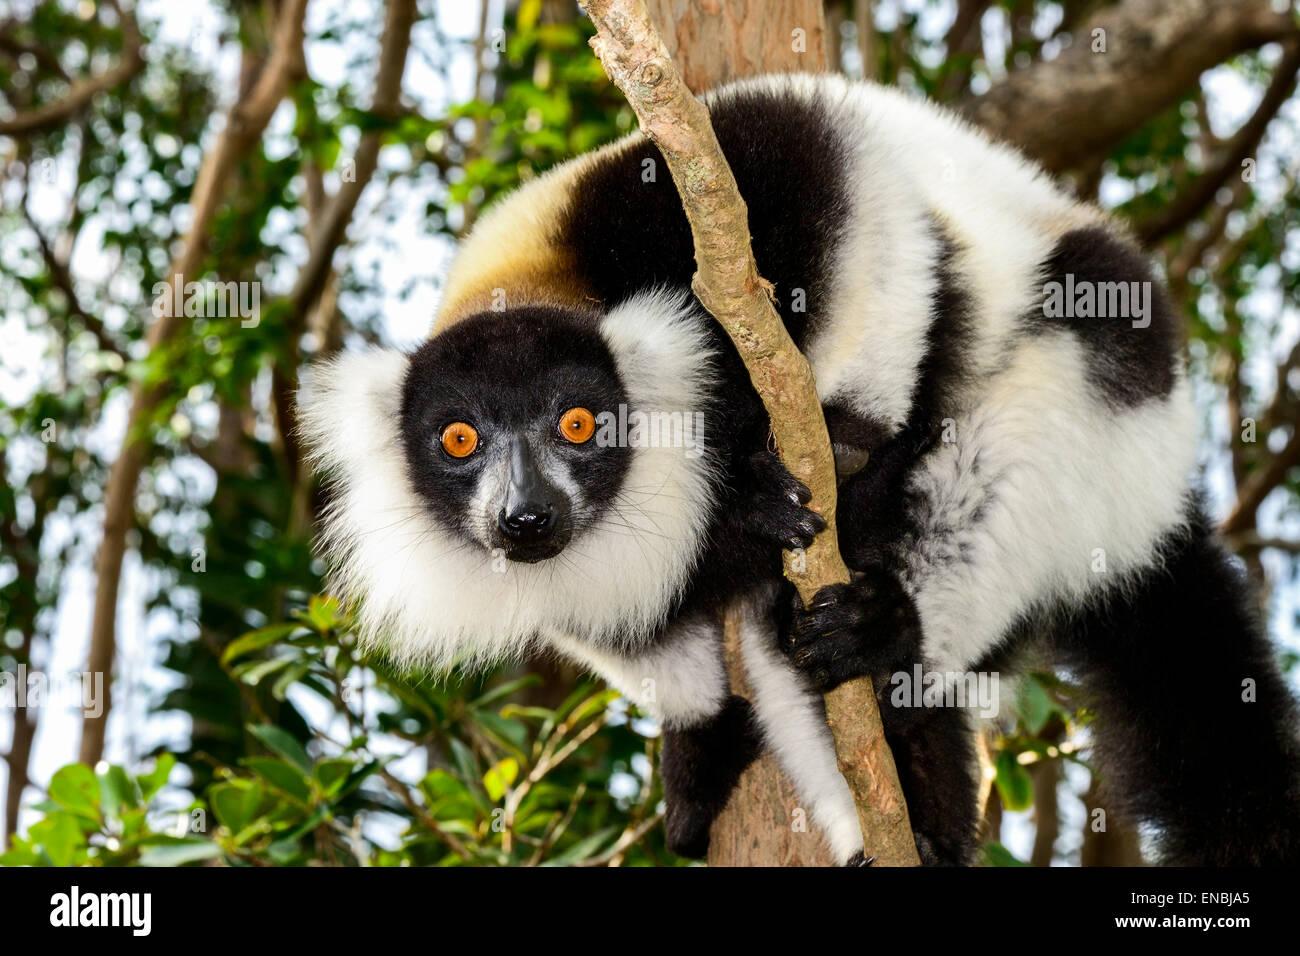 black-and-white ruffed lemur, lemur island, andasibe, madagascar Stock Photo